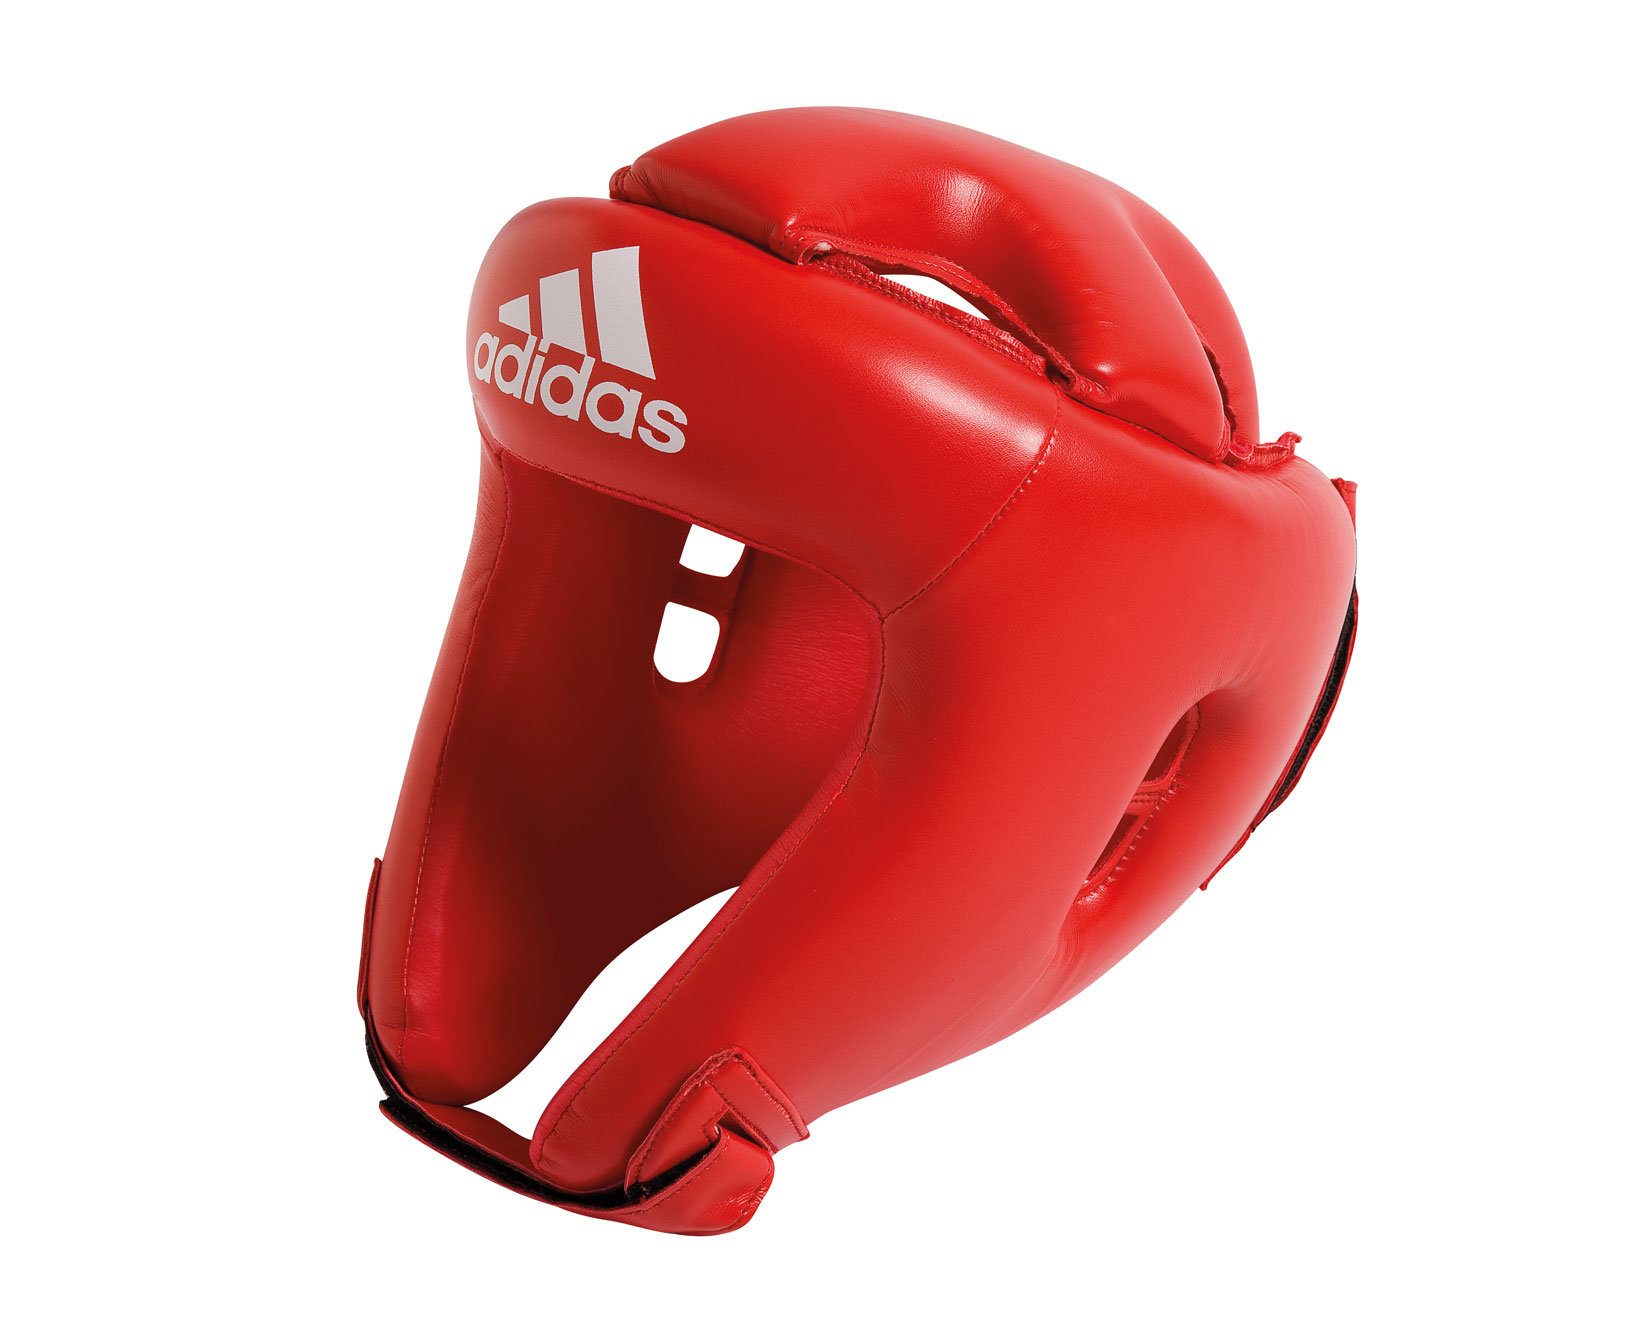 Шлем боксерский Competition Head Guard красный (размер S)